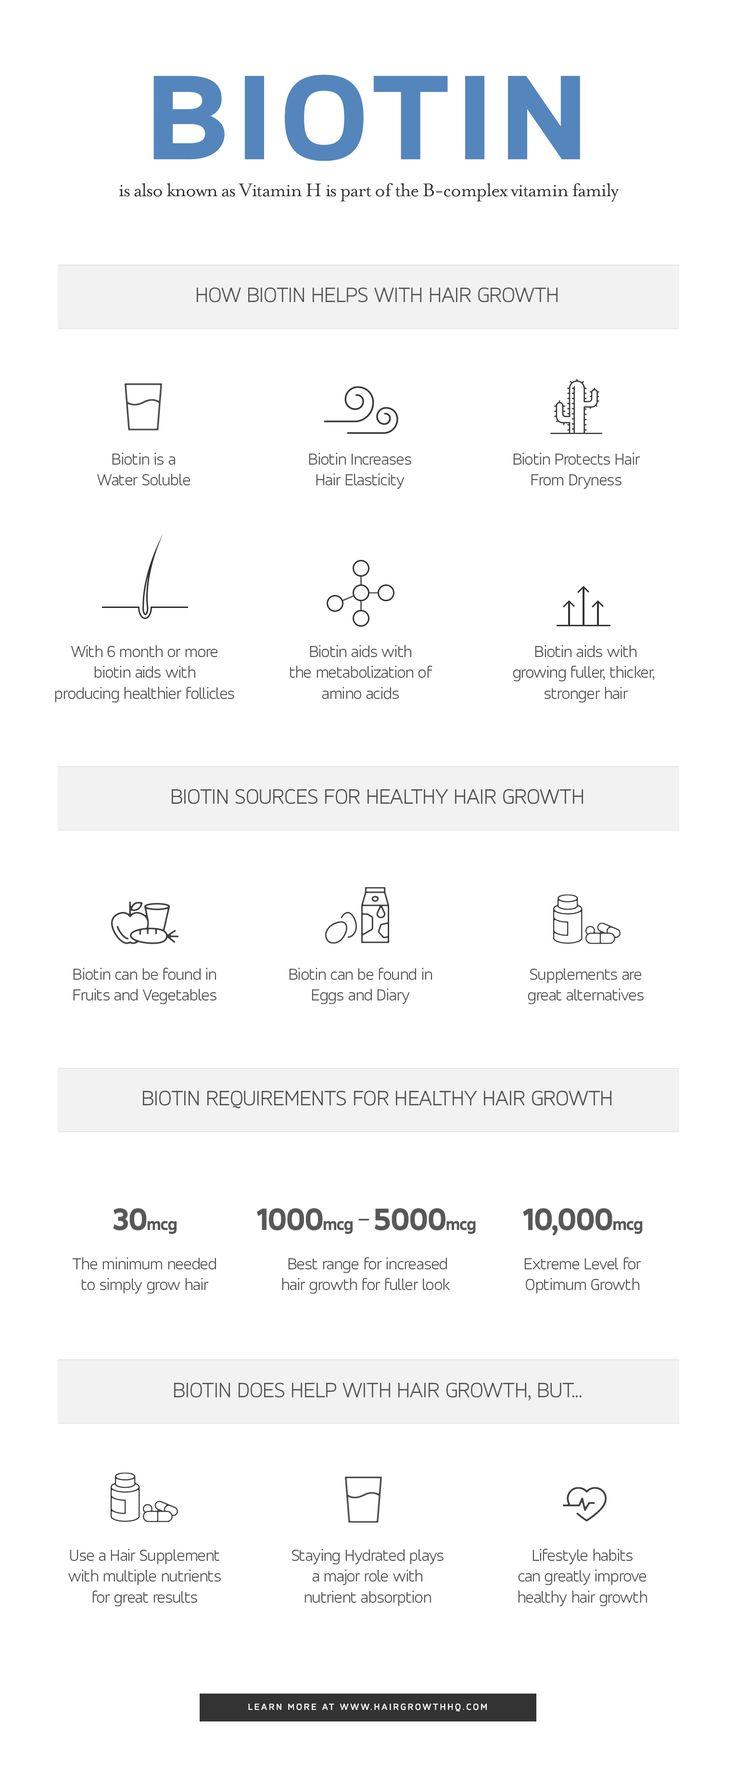 Biotin and Hair Growth - How Biotin helps with healthy hair growth | Hairgrowthh...